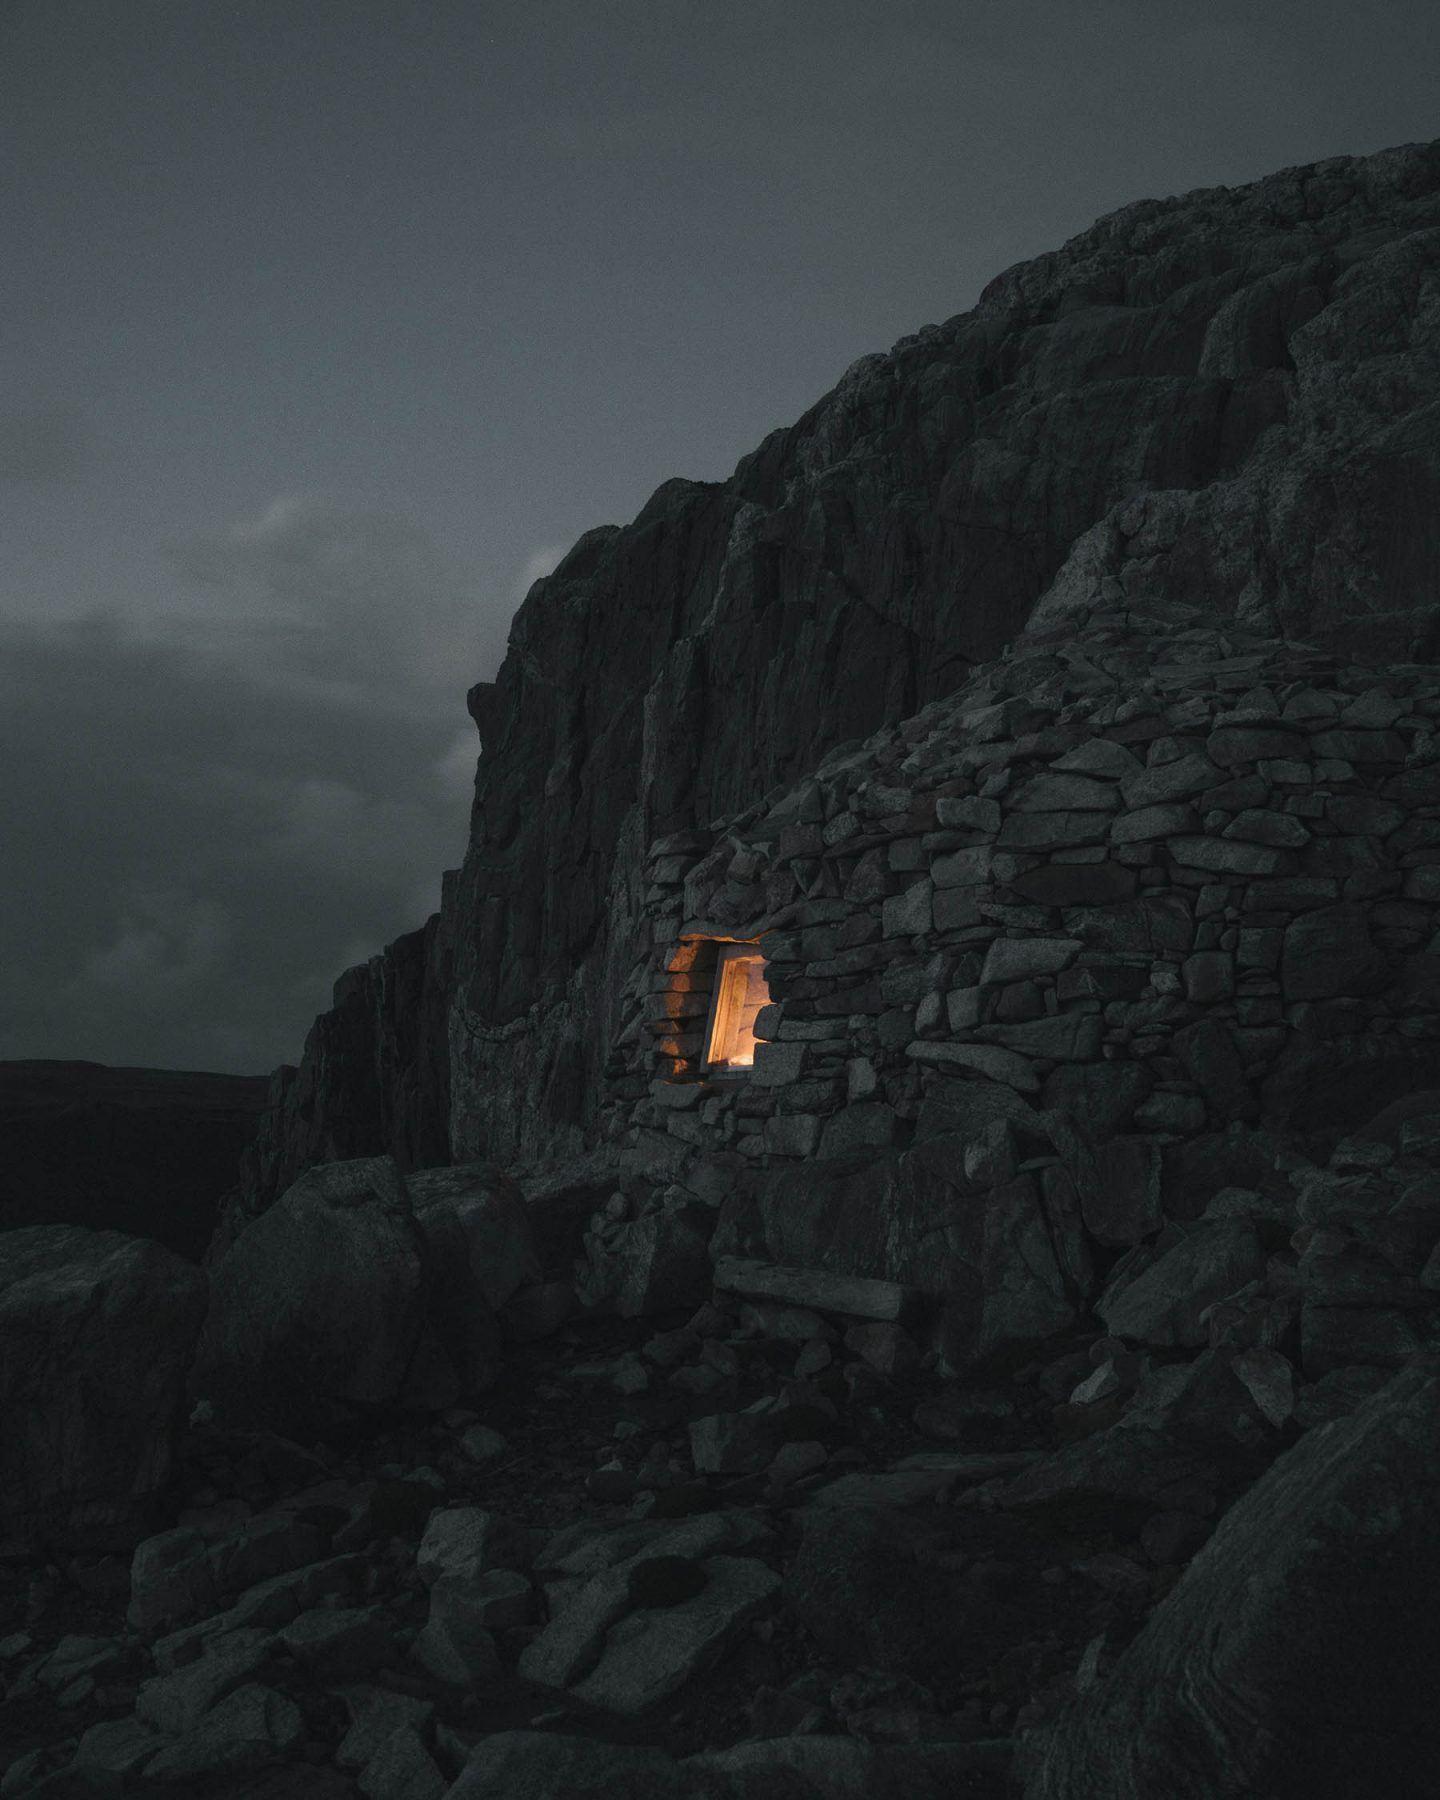 IGNANT-Photography-Ruairidh-Mcglynn-Emerging-Land-4